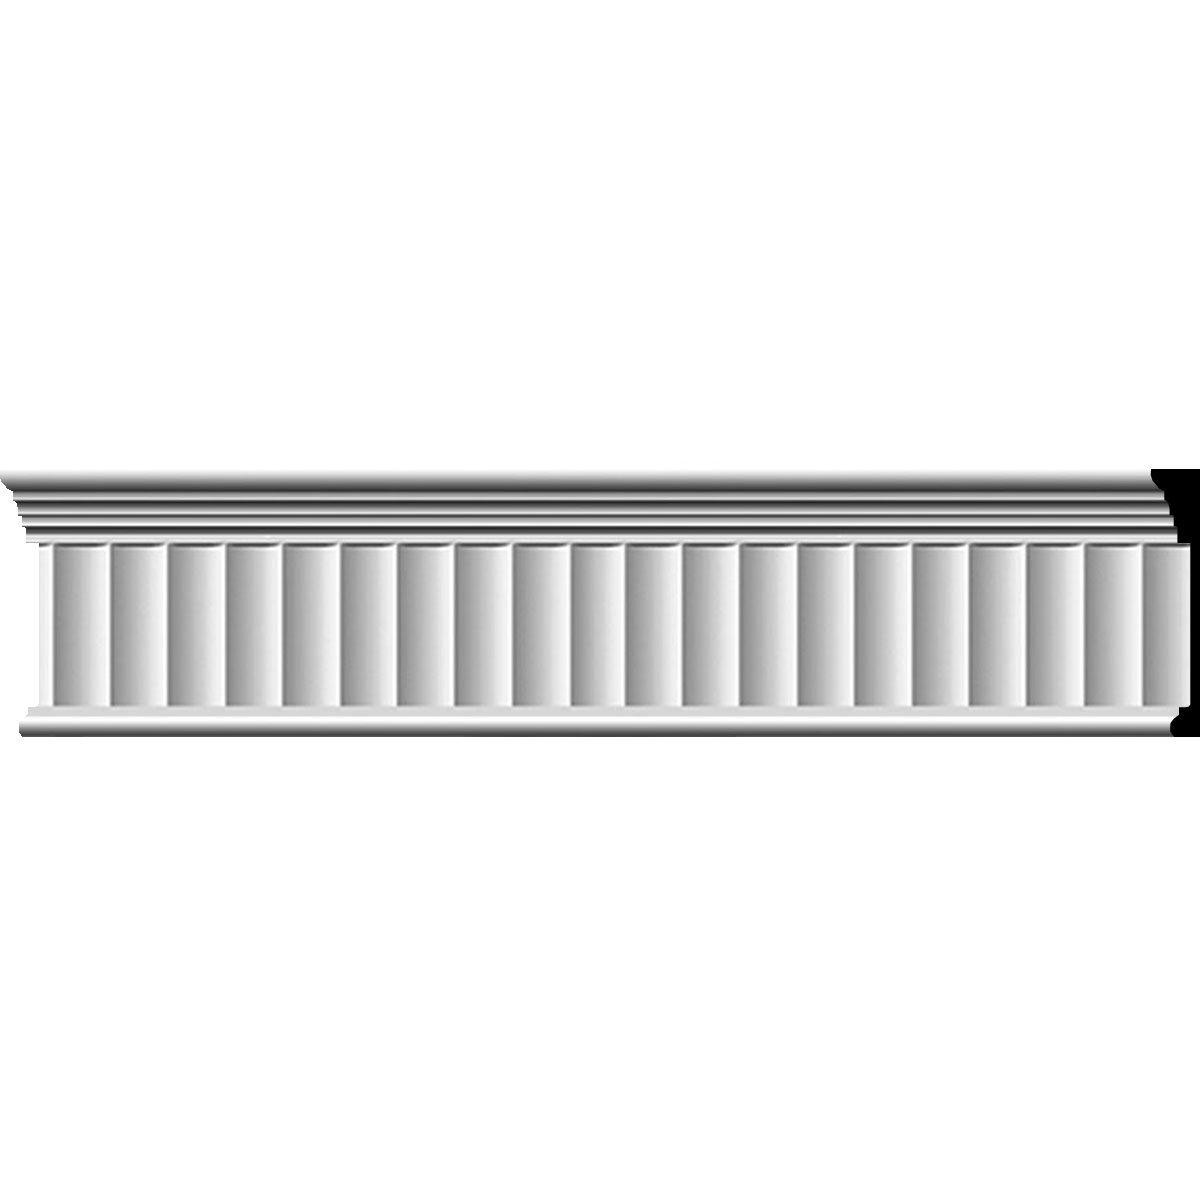 Ekena Millwork MLD07X01EL-CASE-8 7-3/4'' H x 1'' P x 96'' L Elsinor Fluted Frieze (8-Pack)